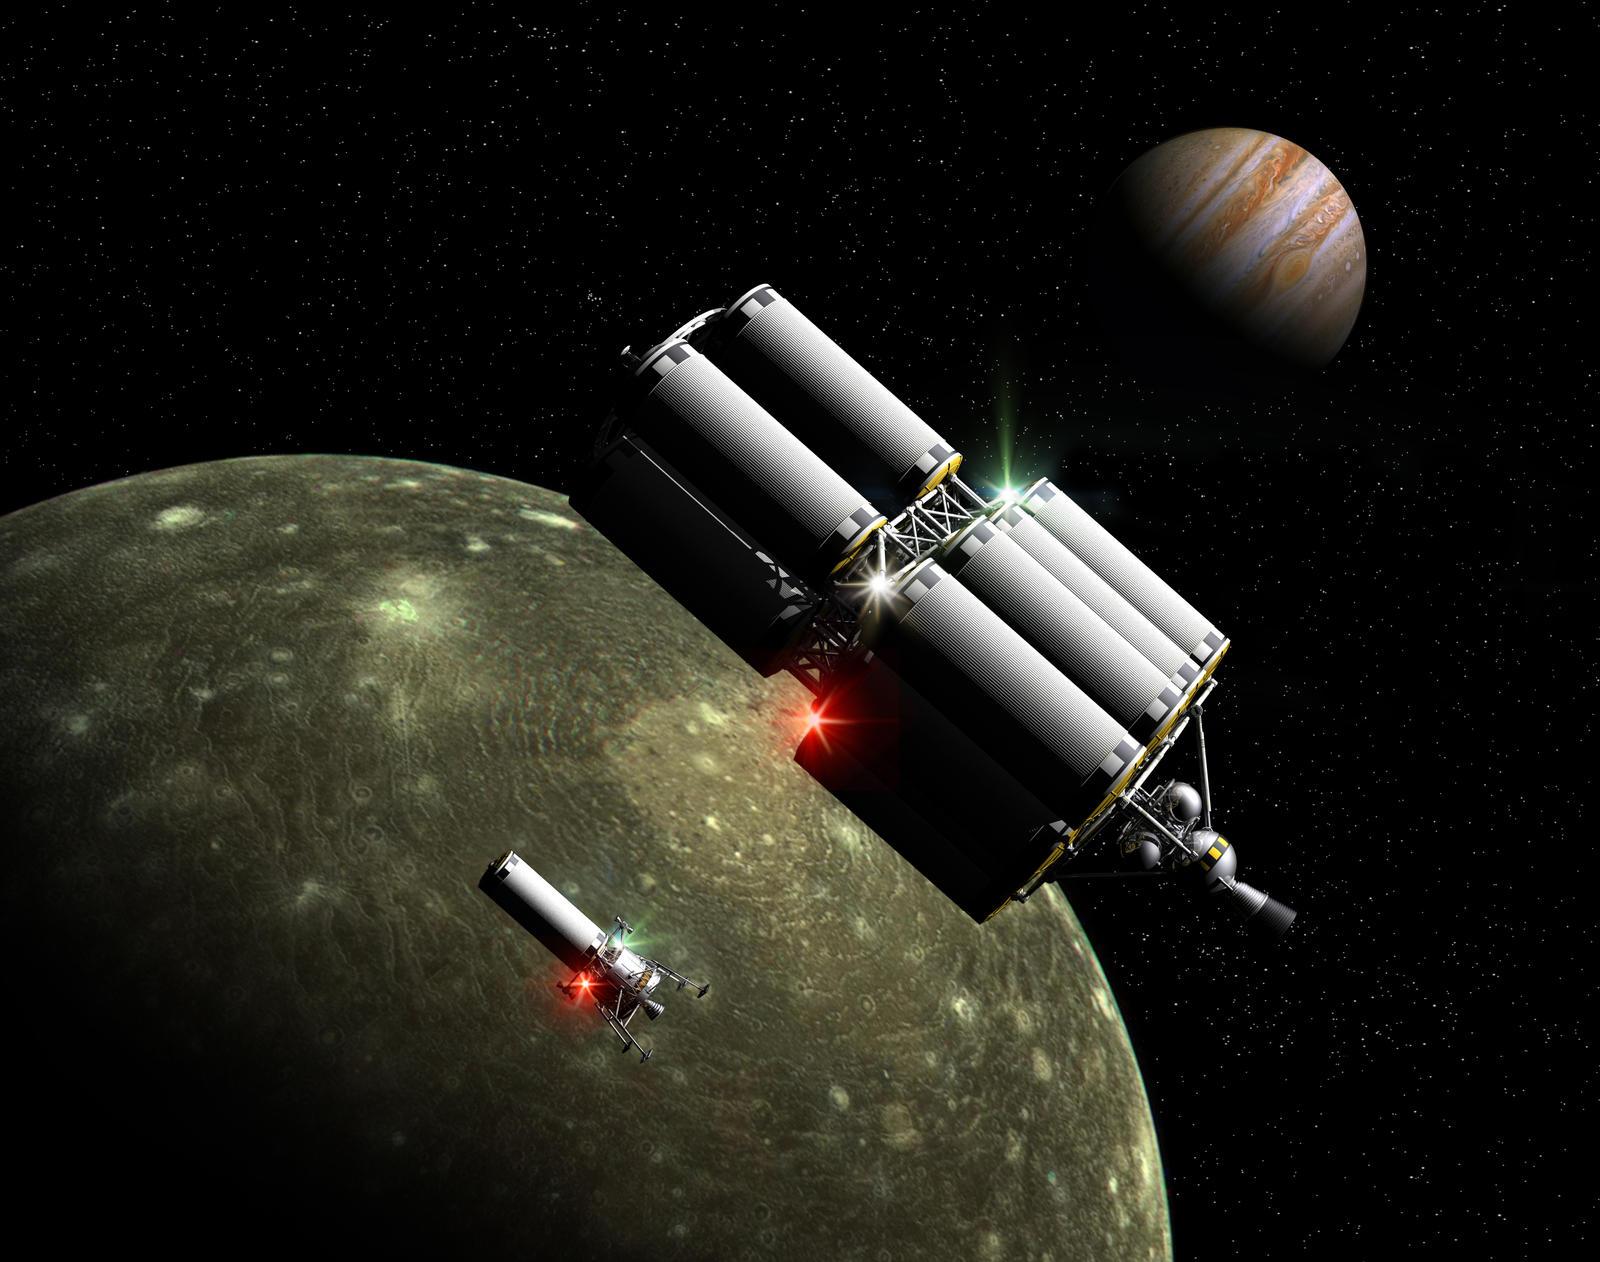 Lighter and Tanker Callisto Orbit